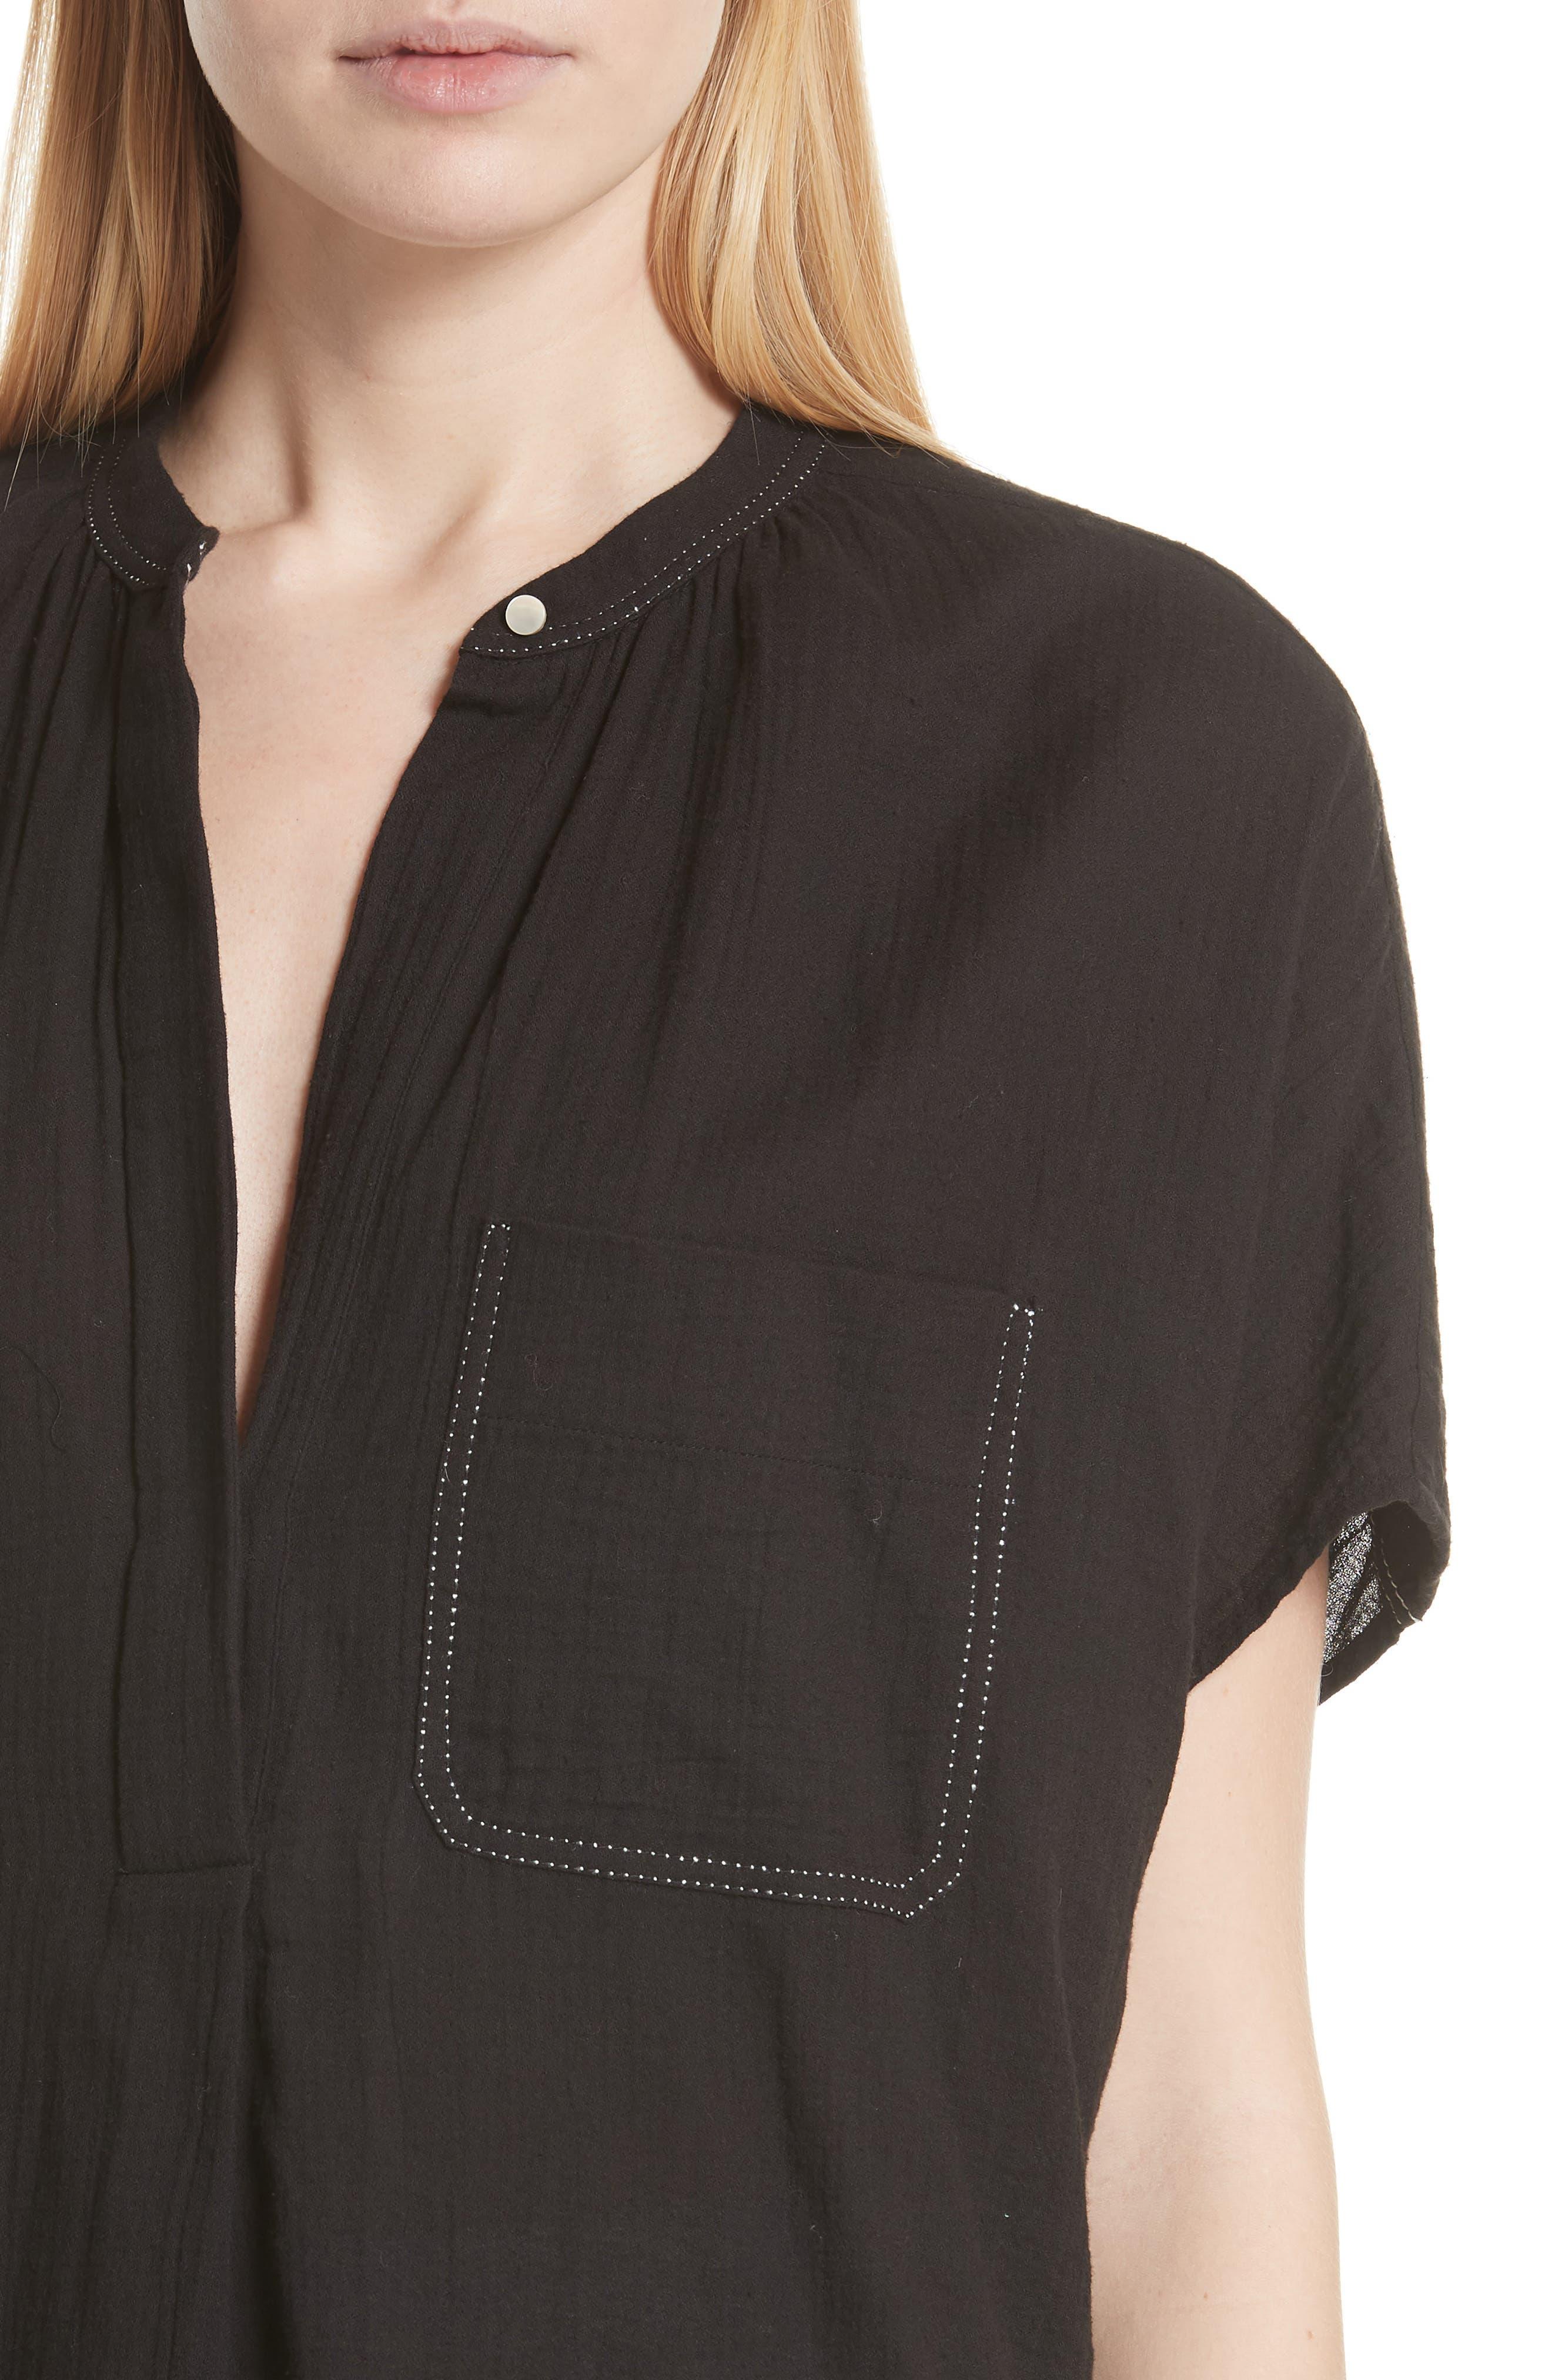 Topstitch Crinkle Cotton Top,                             Alternate thumbnail 4, color,                             Black